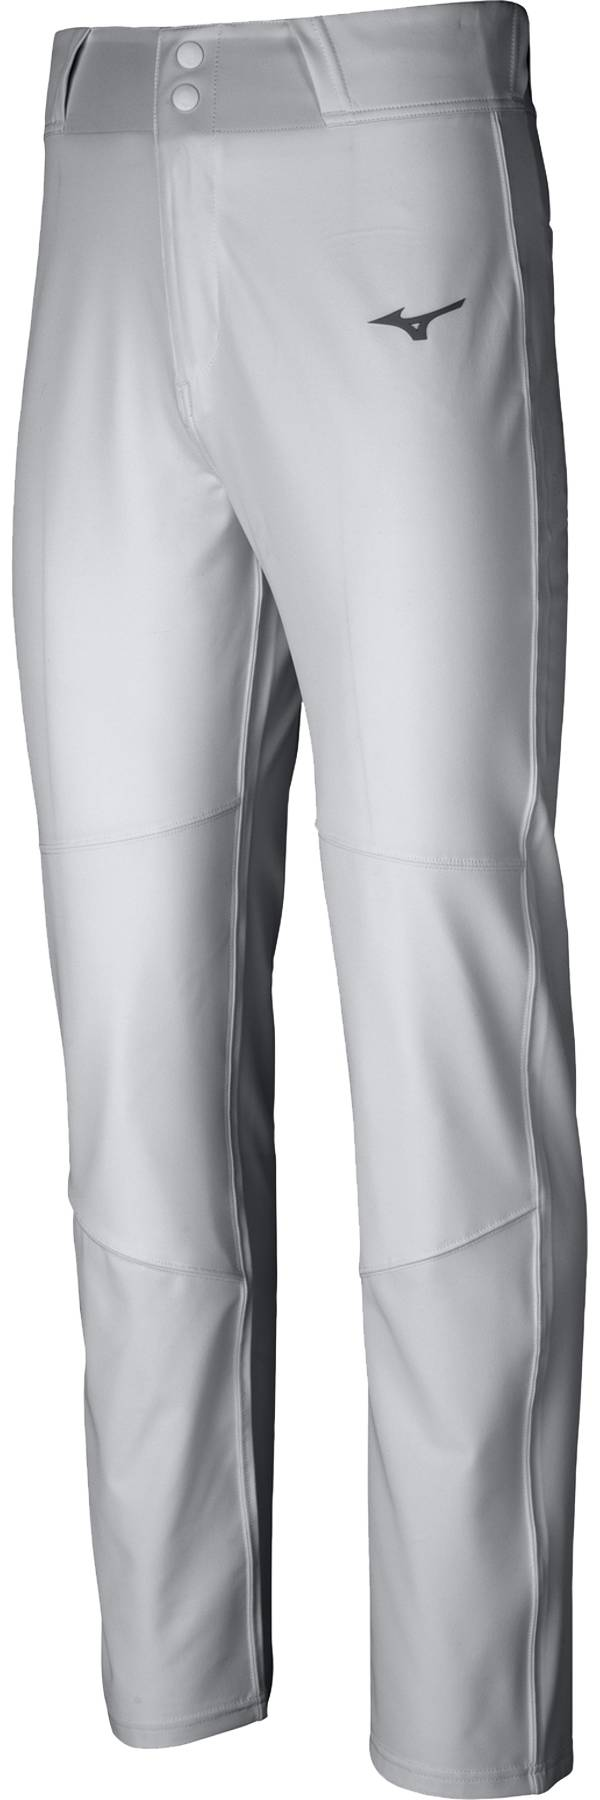 Mizuno Men's MVP Pro Woven Baseball Pants product image